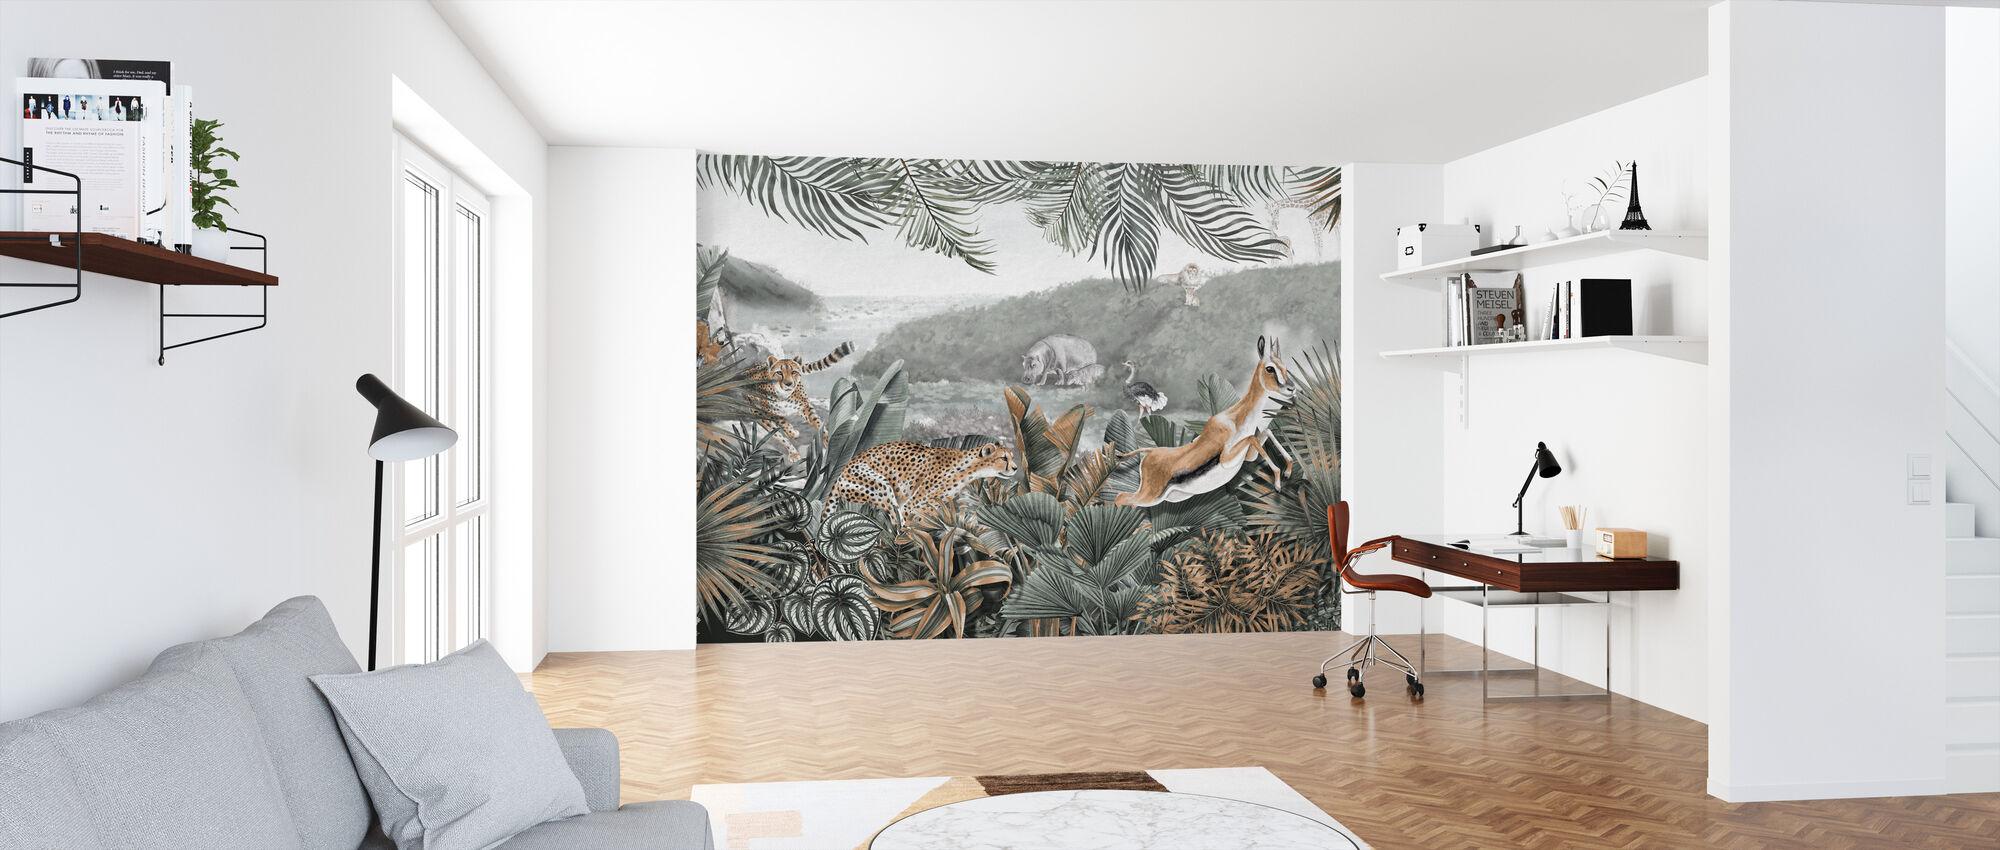 Jungle Insights II - Wallpaper - Office